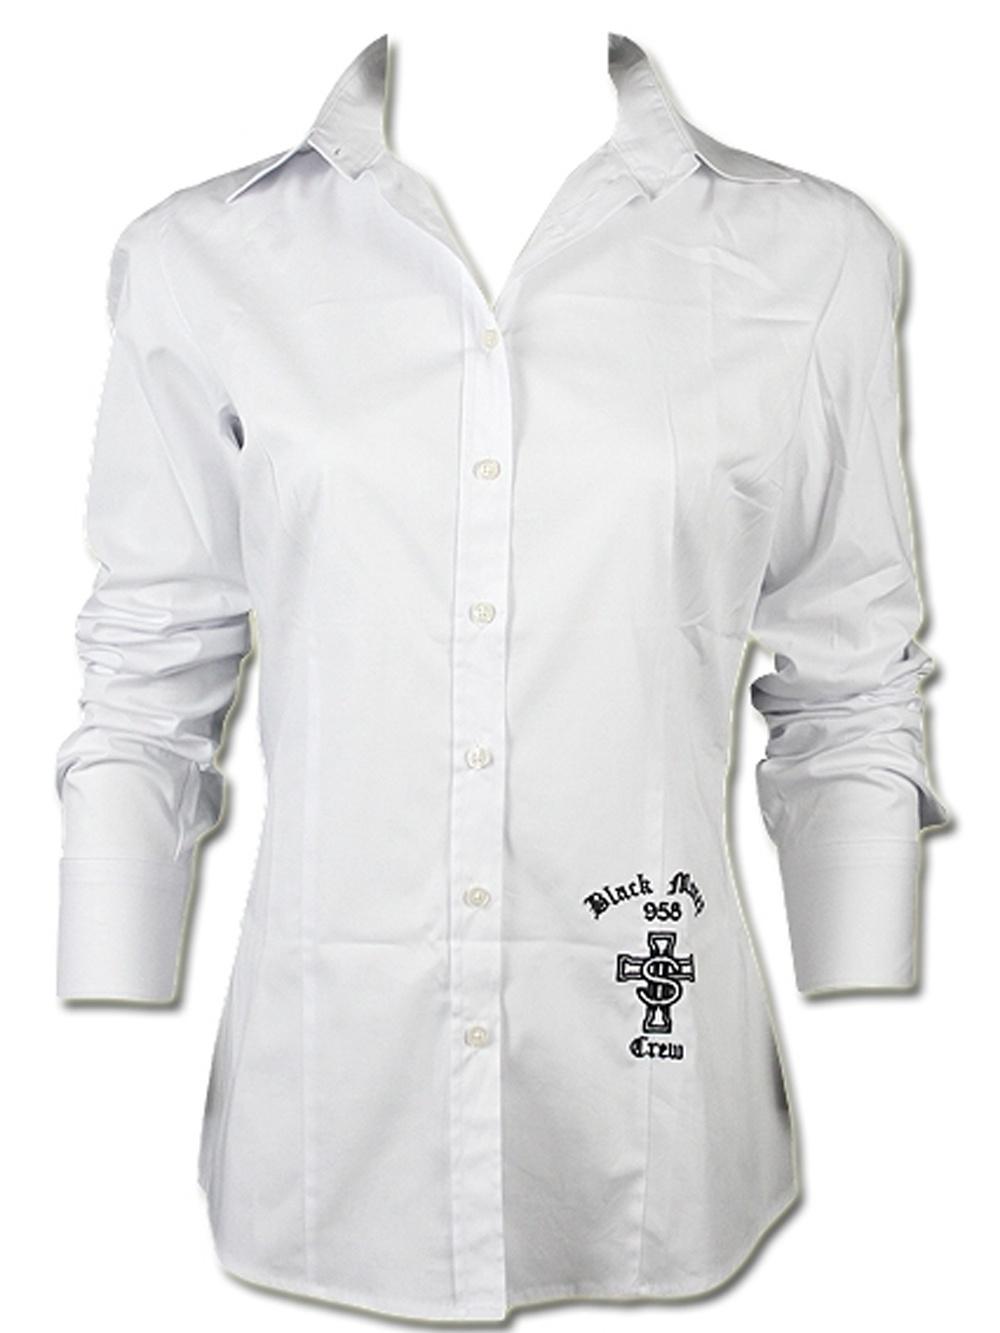 077c322abb Black Money Crew Damen Bluse Logo - Black Money Crew 3902 - Blusen ...